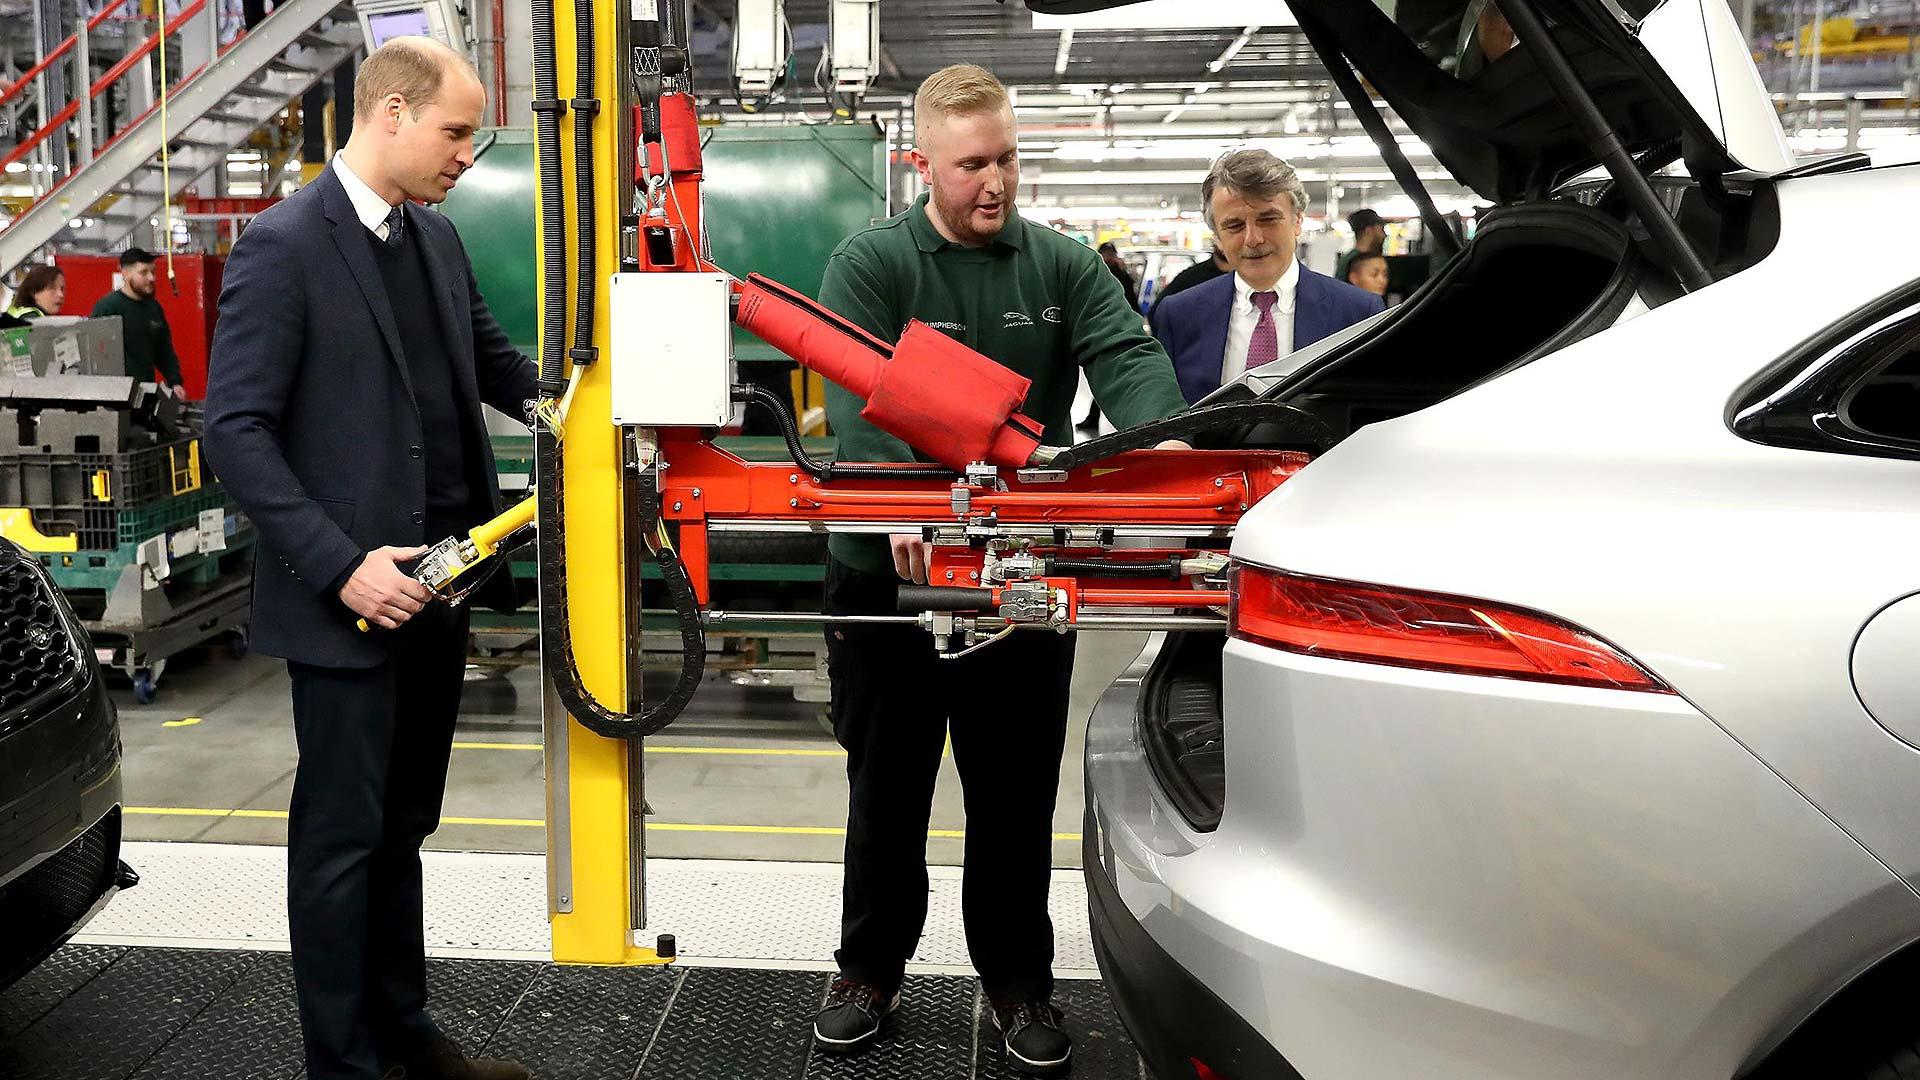 HRH Prince William visiting JLR plant